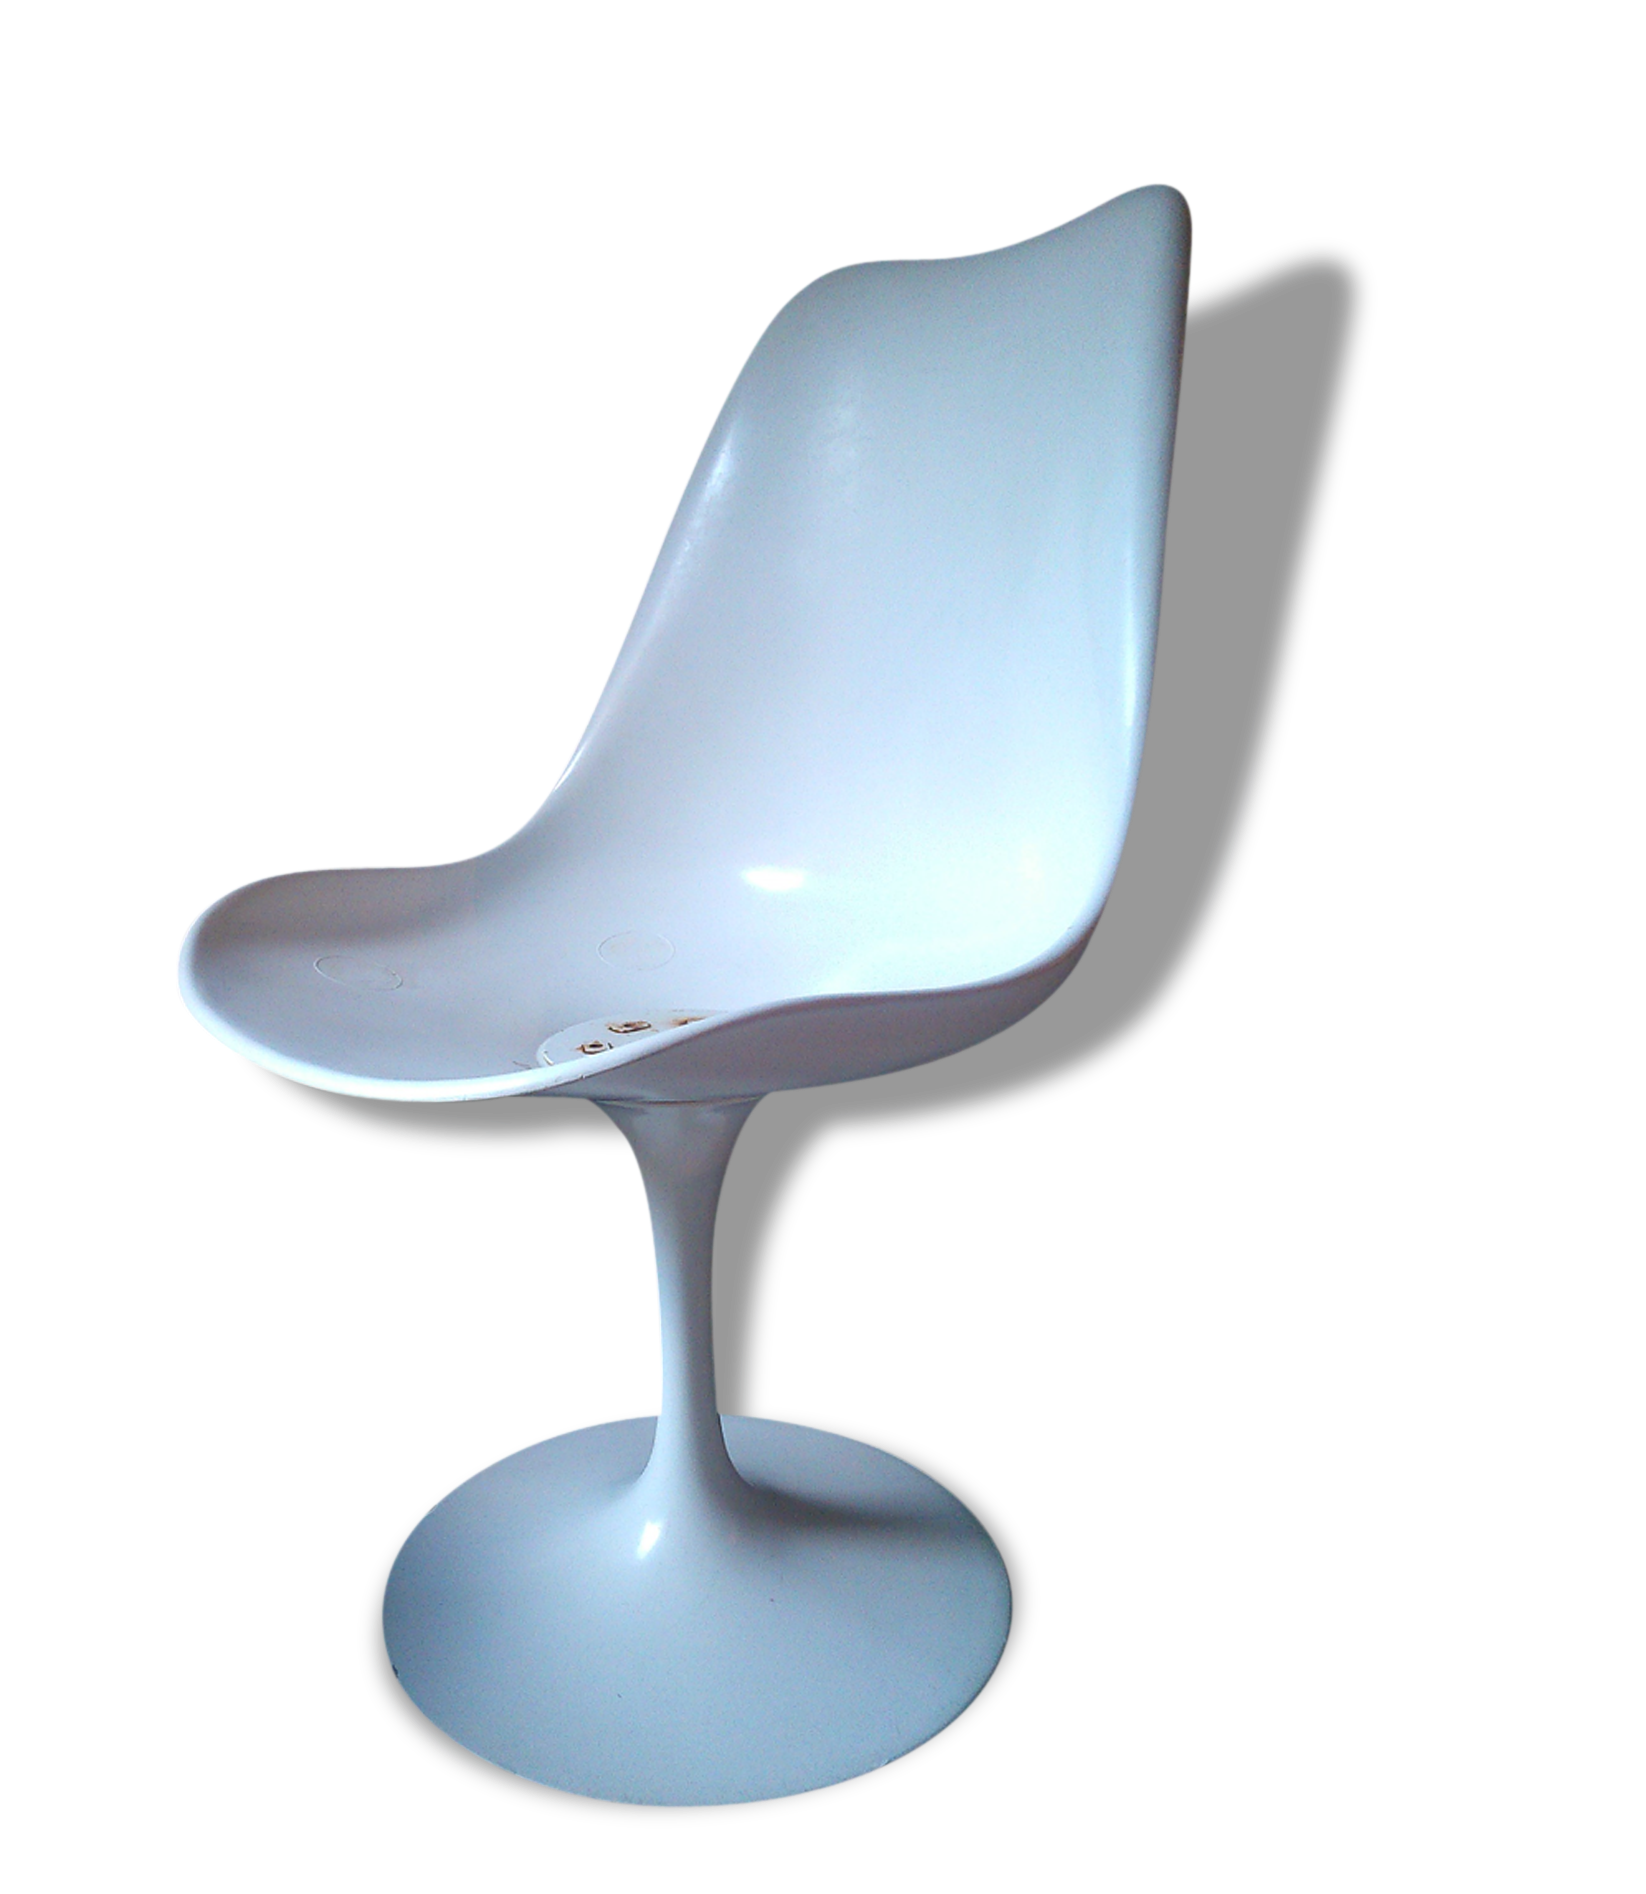 chaise tulipe maison du monde affordable chaise chaise privee chaise tulipe accoudoirs noir uua. Black Bedroom Furniture Sets. Home Design Ideas